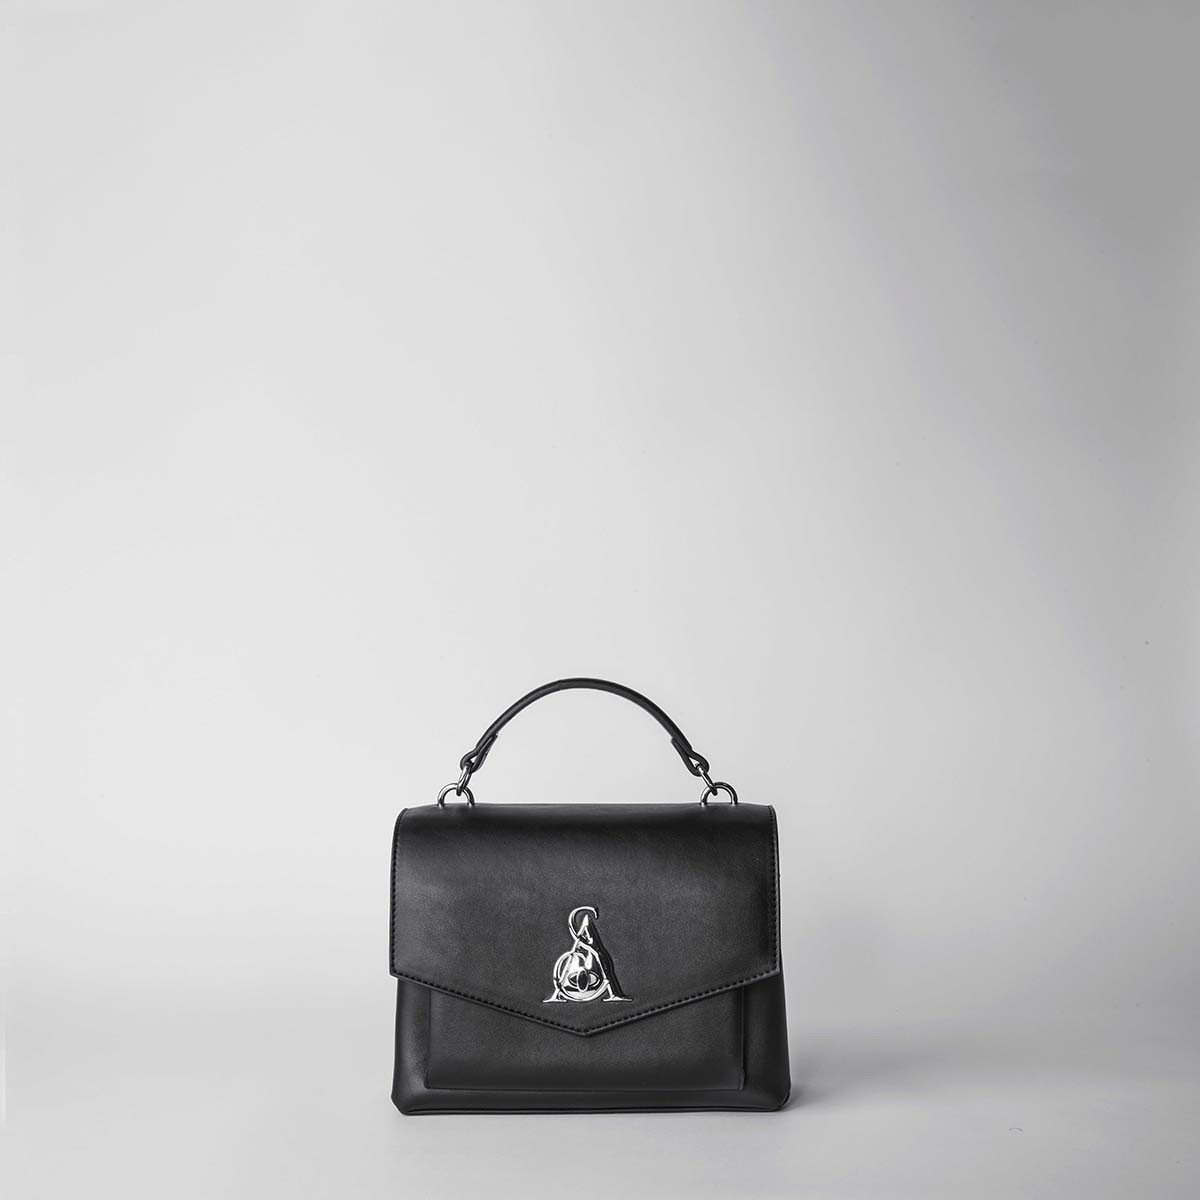 Minibag con logo L'ATELIER DU SAC   11248 PETITE MARILYNNERO